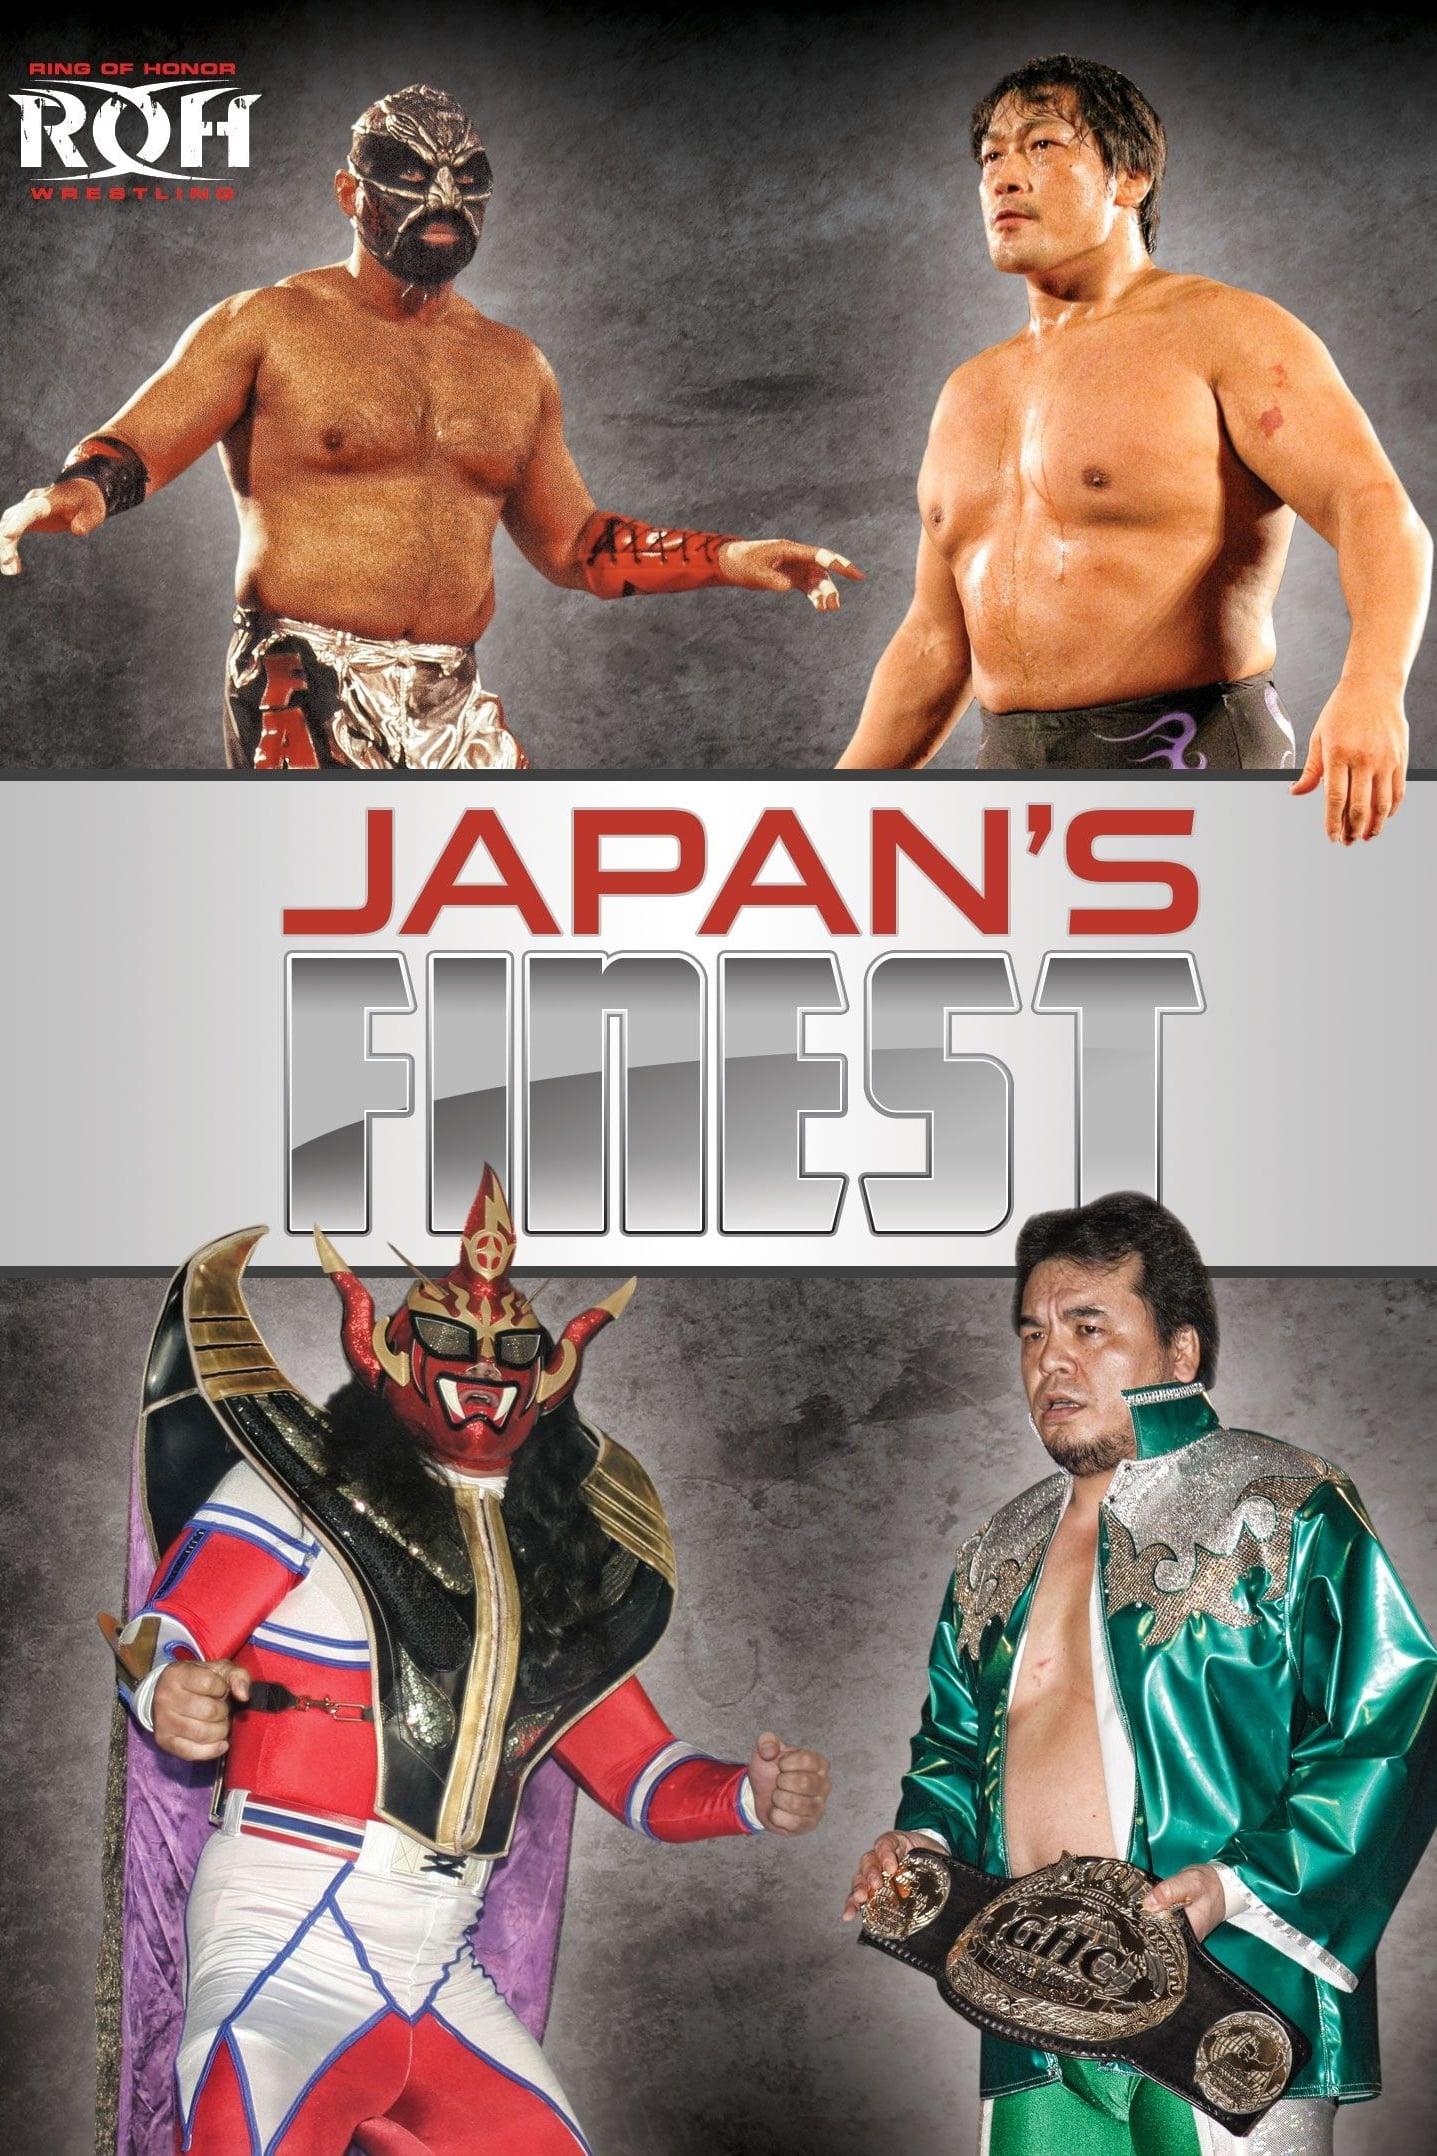 ROH: Japan's Finest